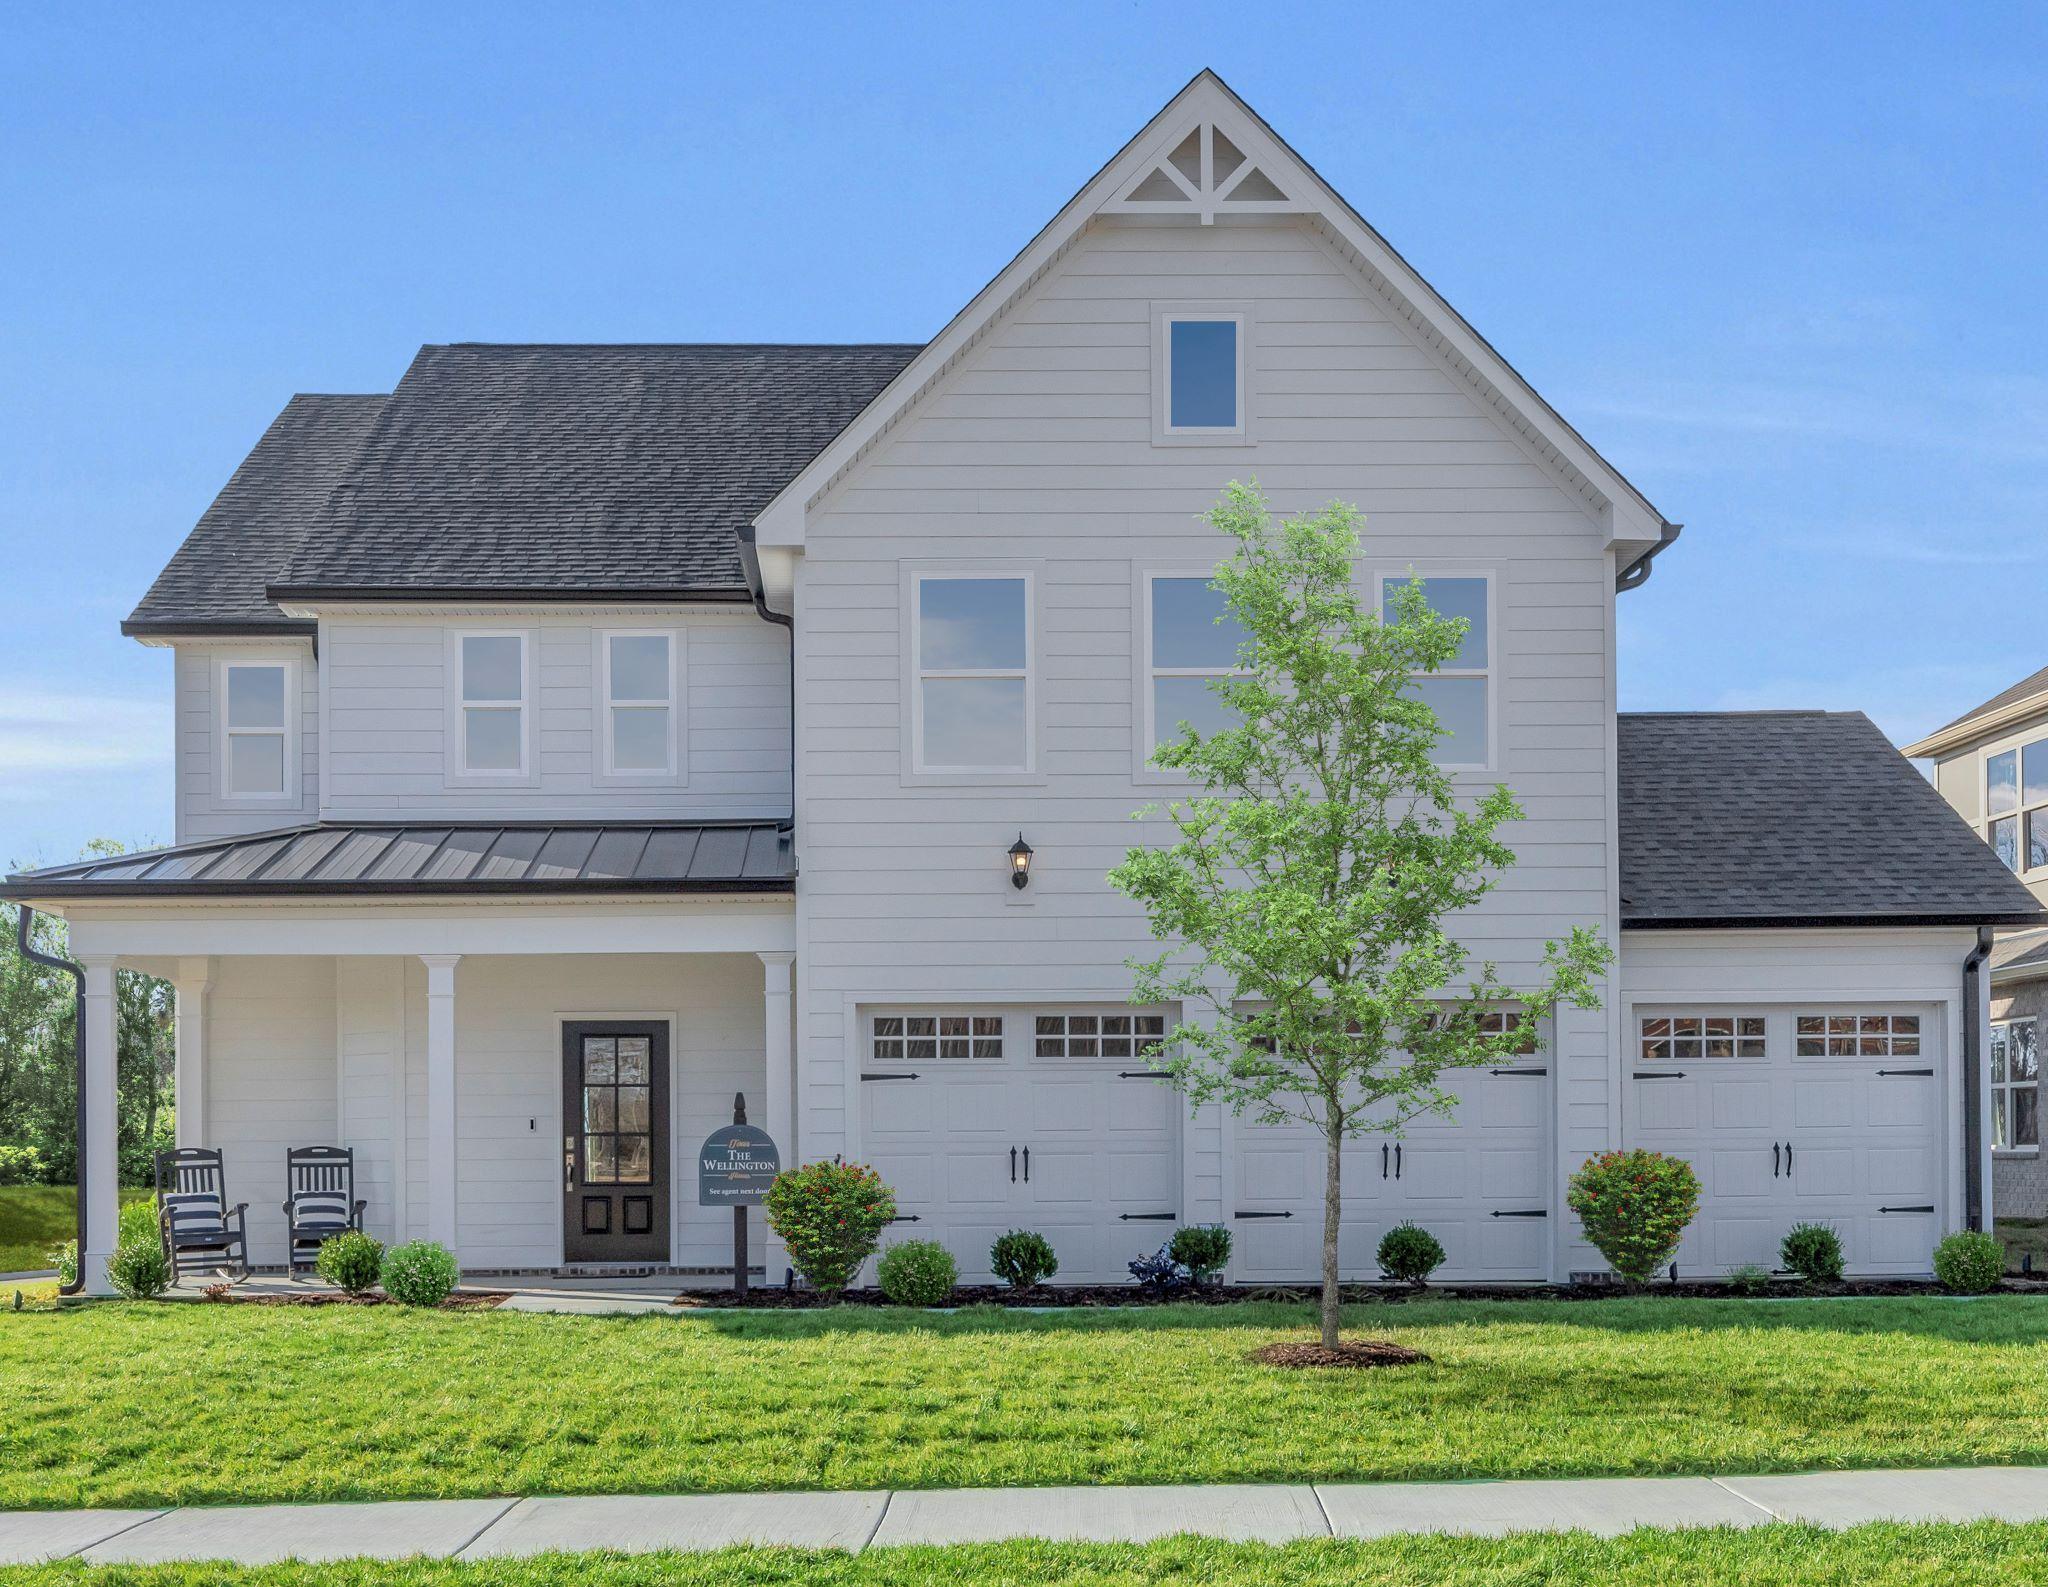 'Bainbridge Park' by Goodall Homes in Chattanooga